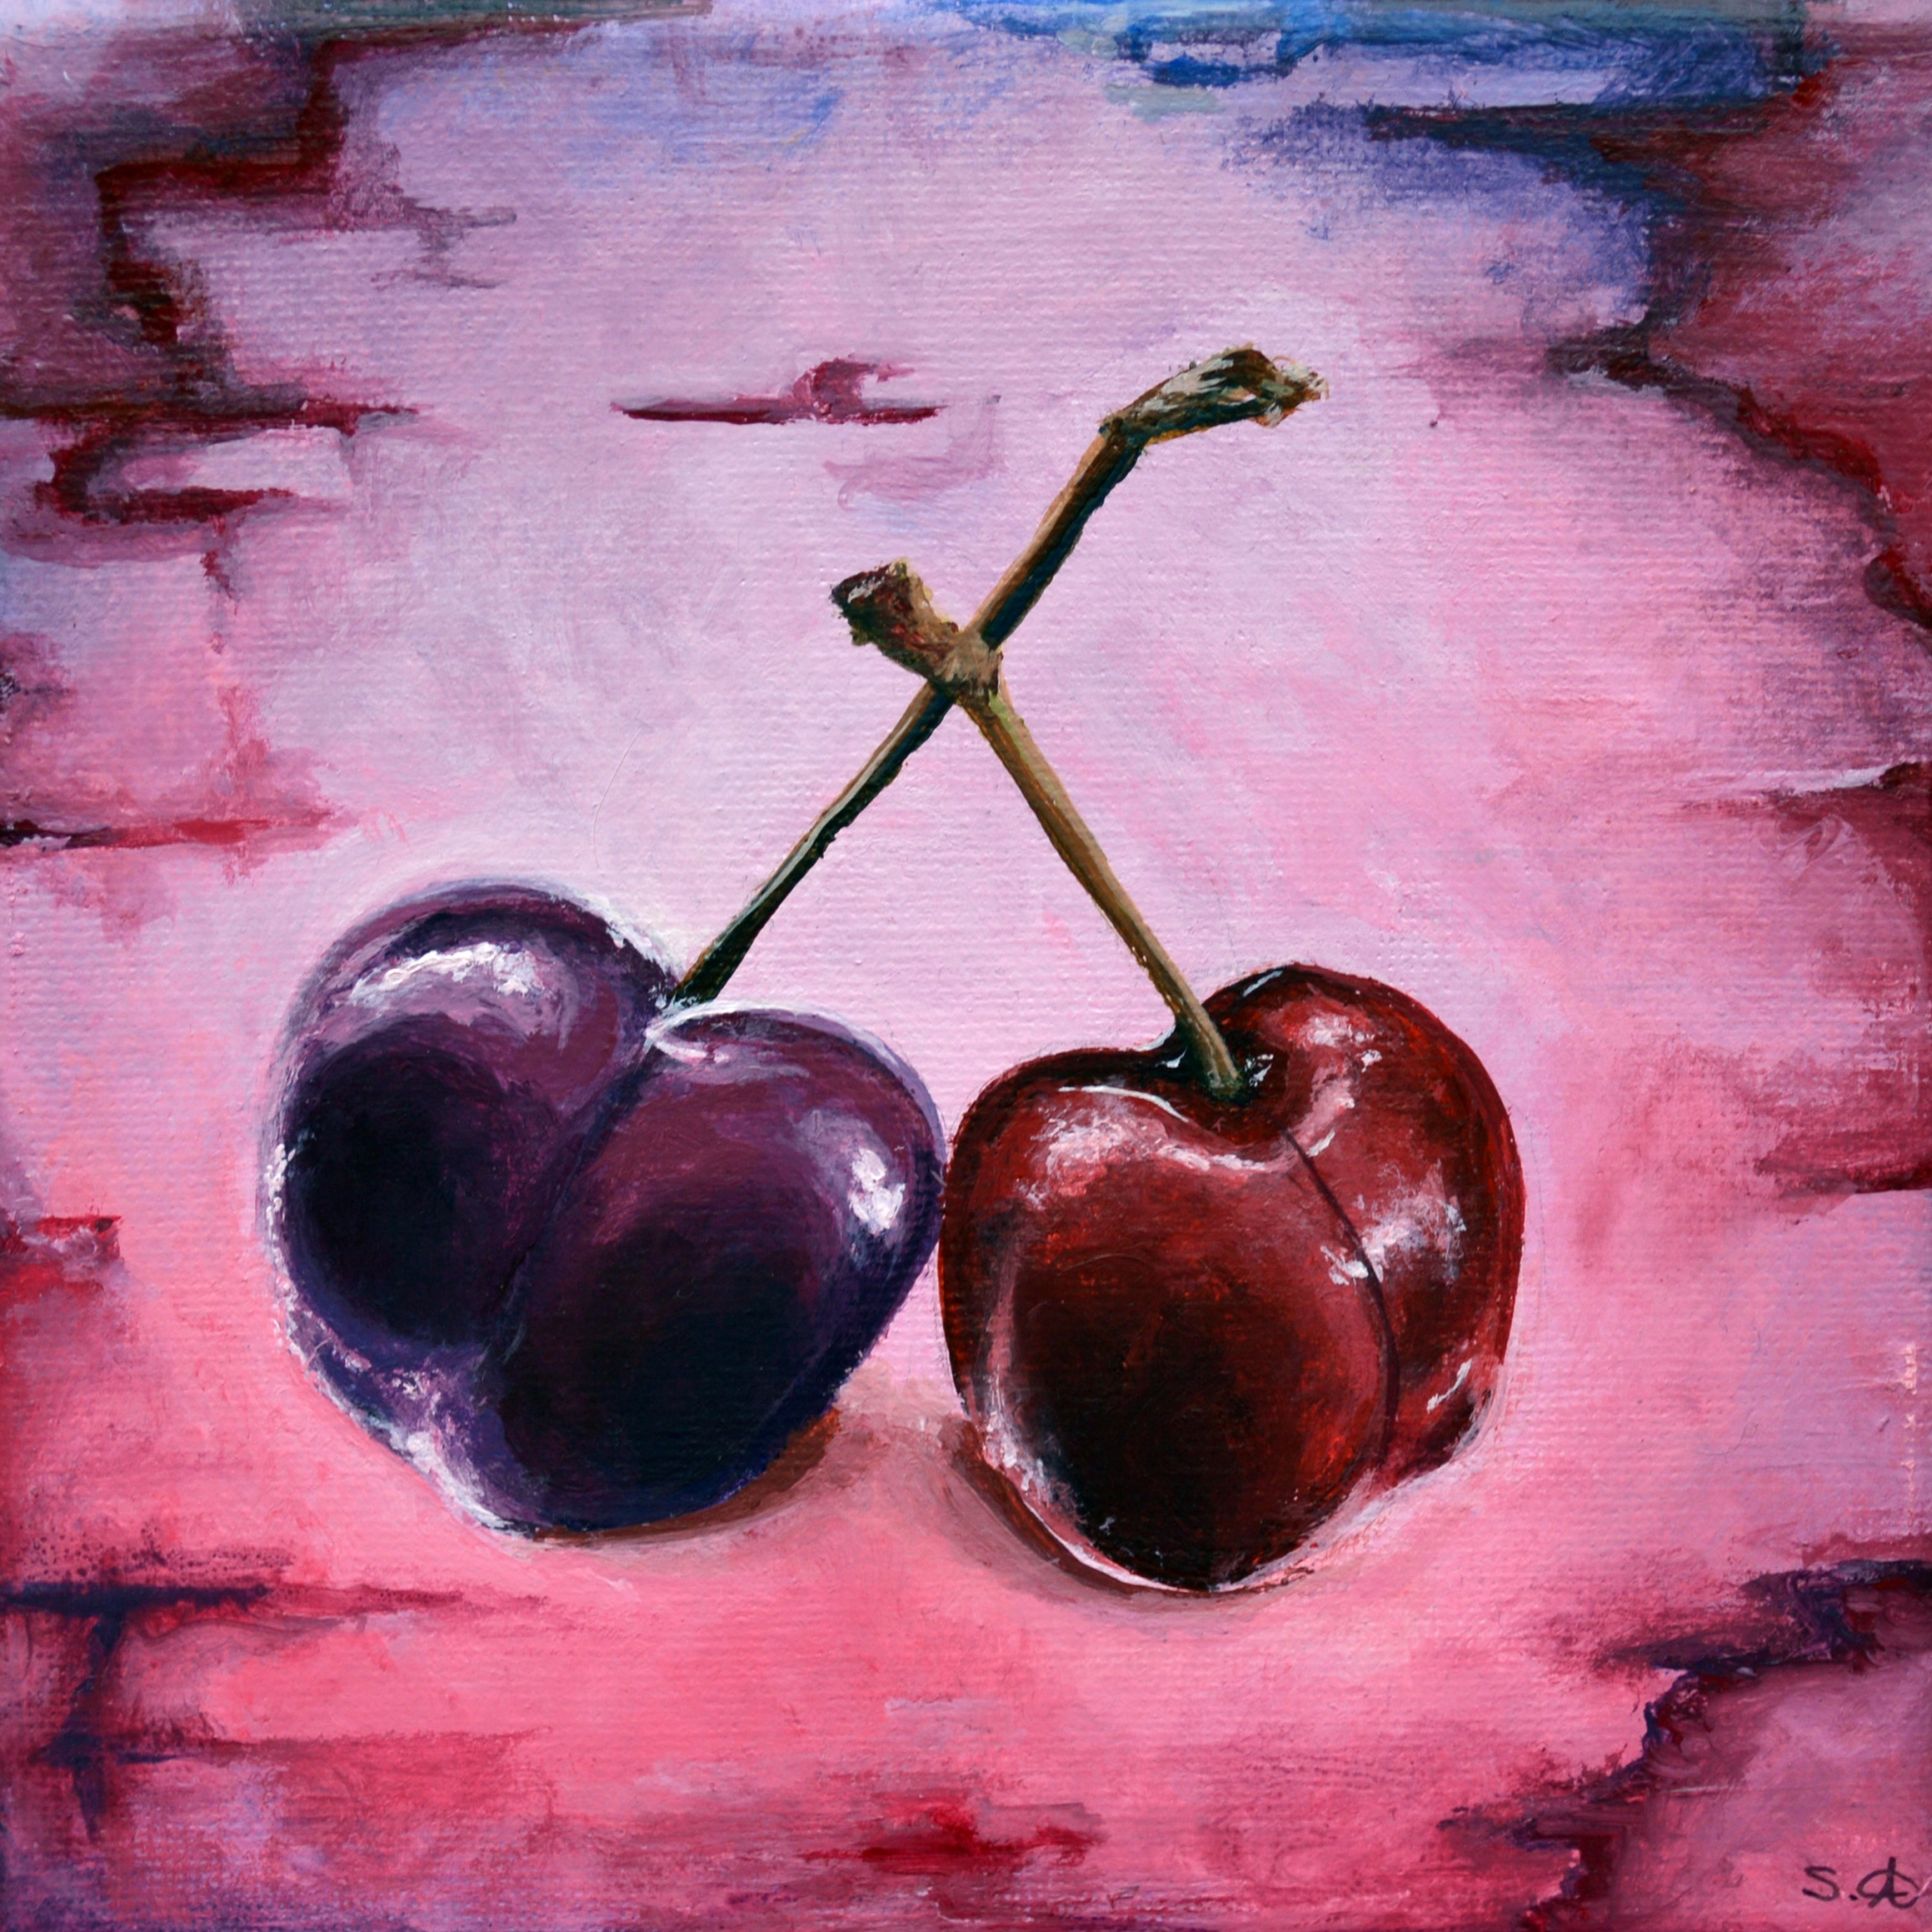 Summer Fruits: Purple Cherries